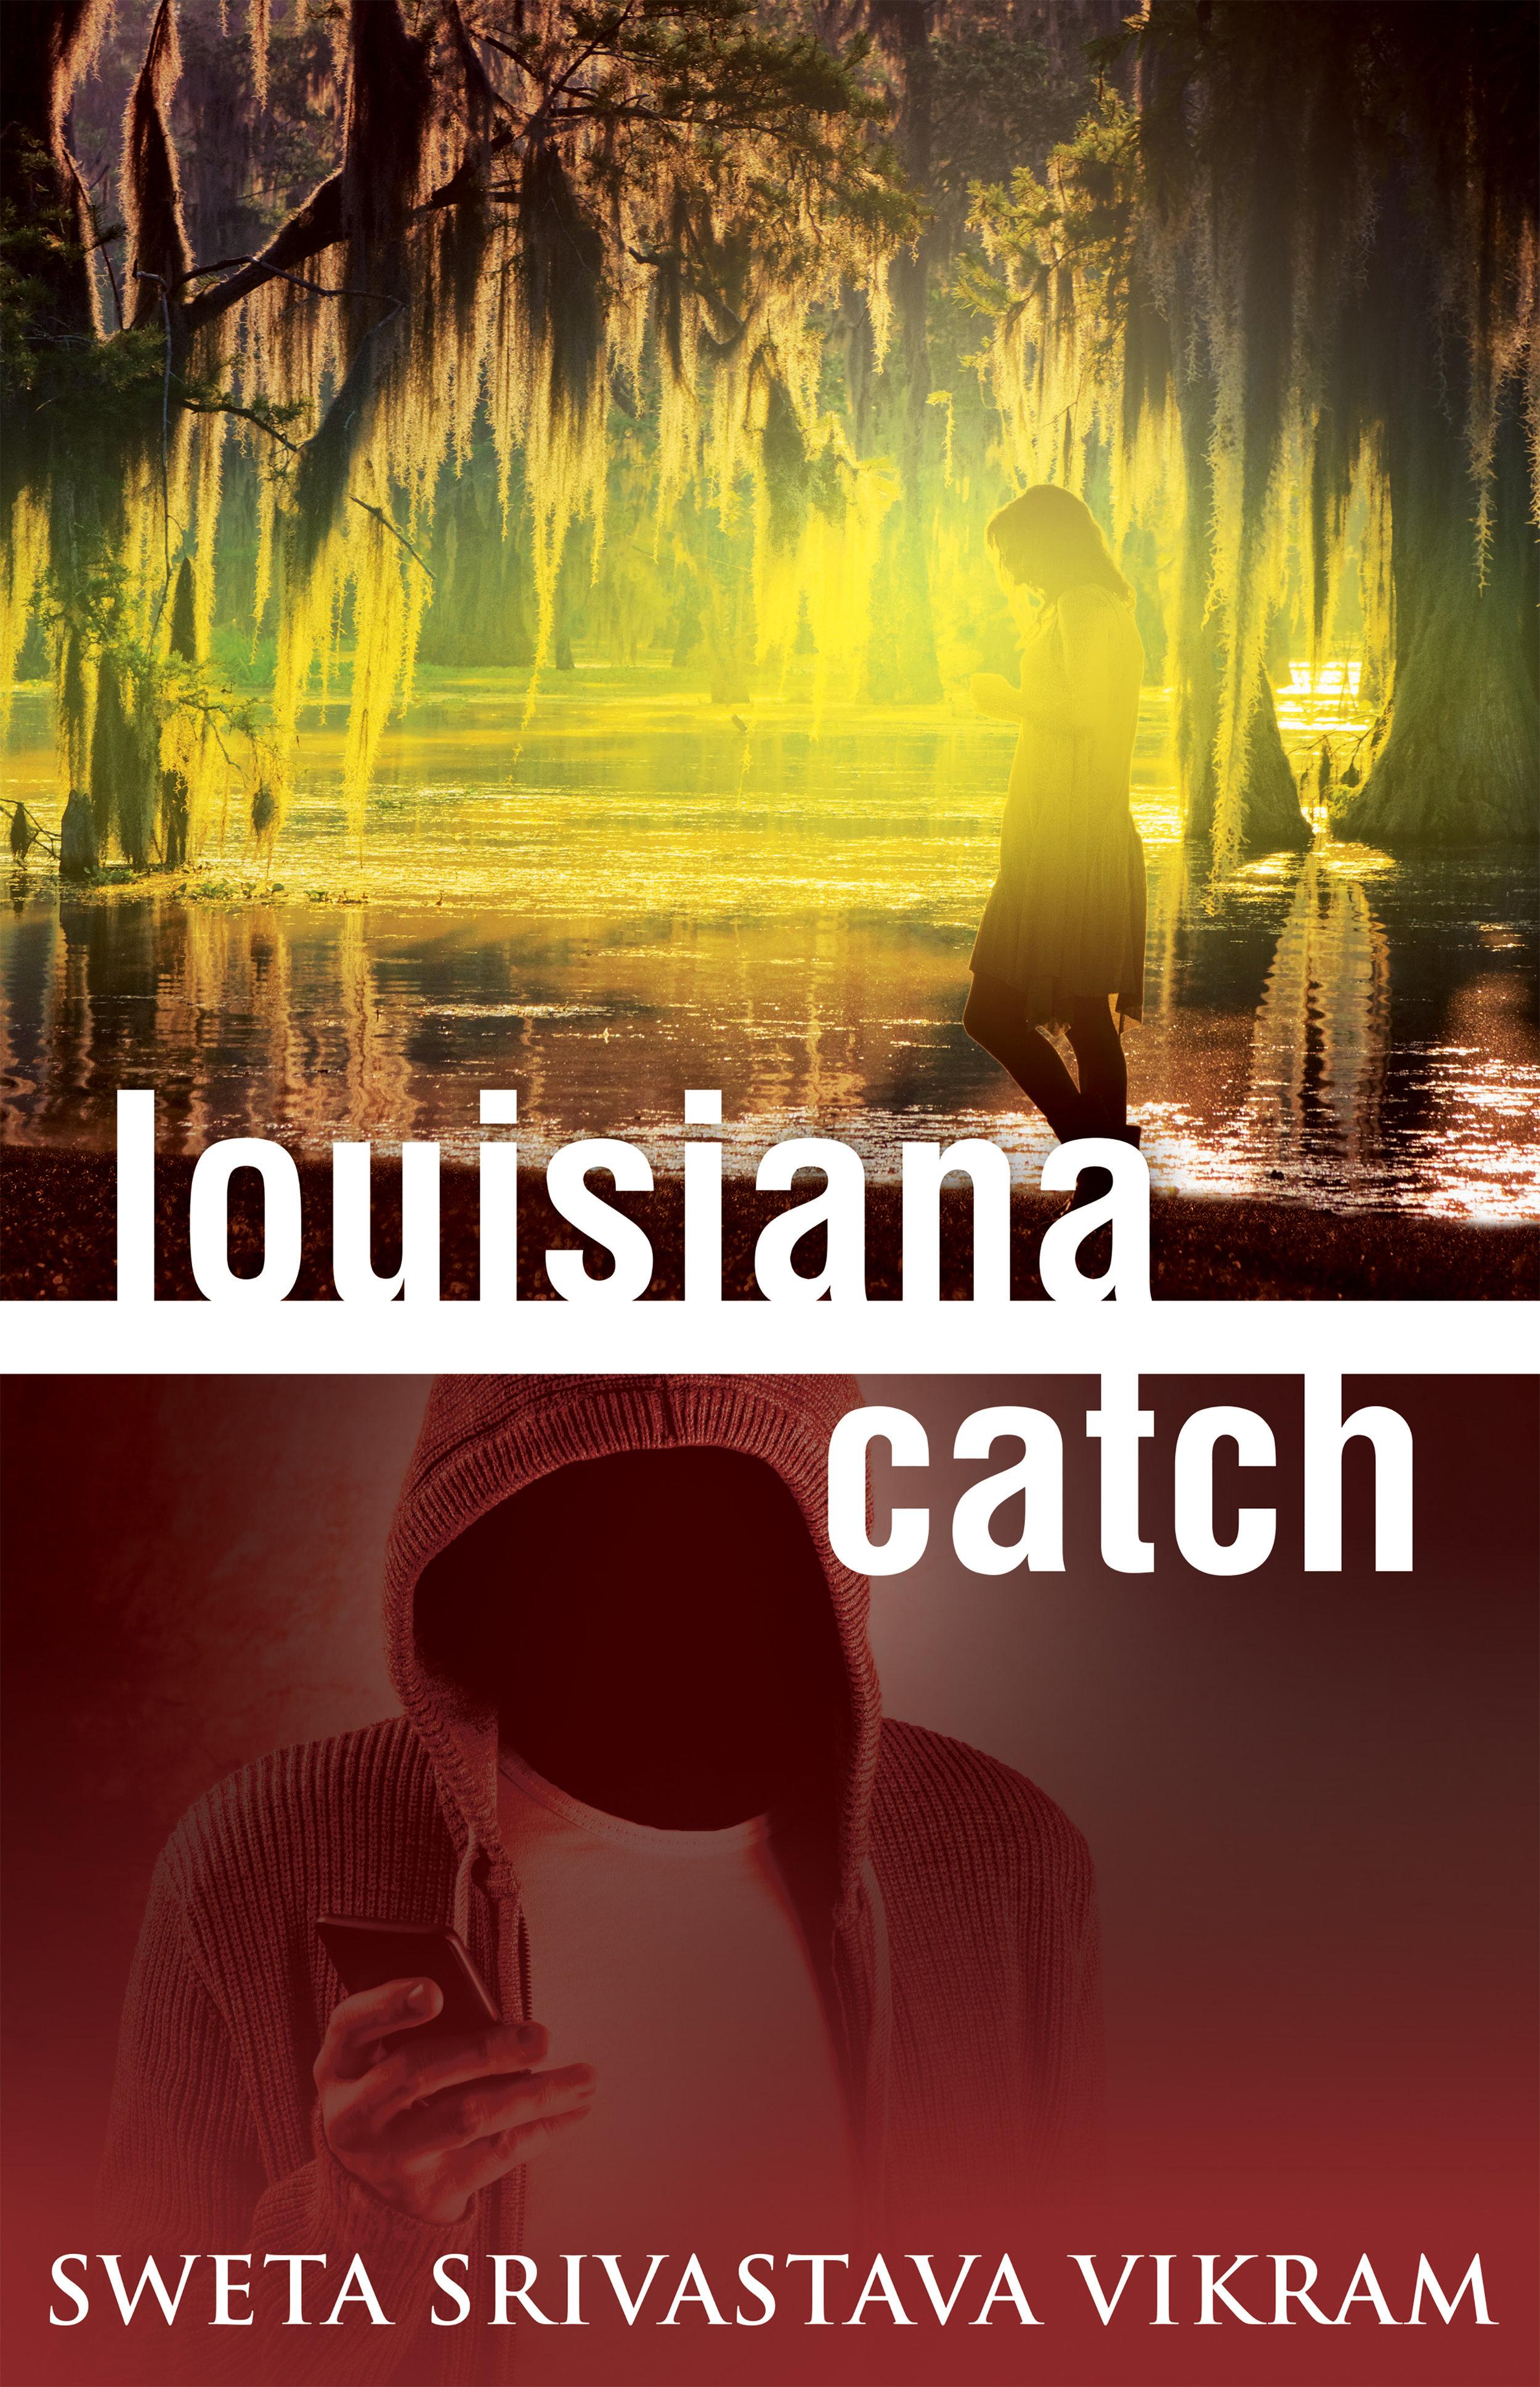 LouisianaCatch_cover.jpg